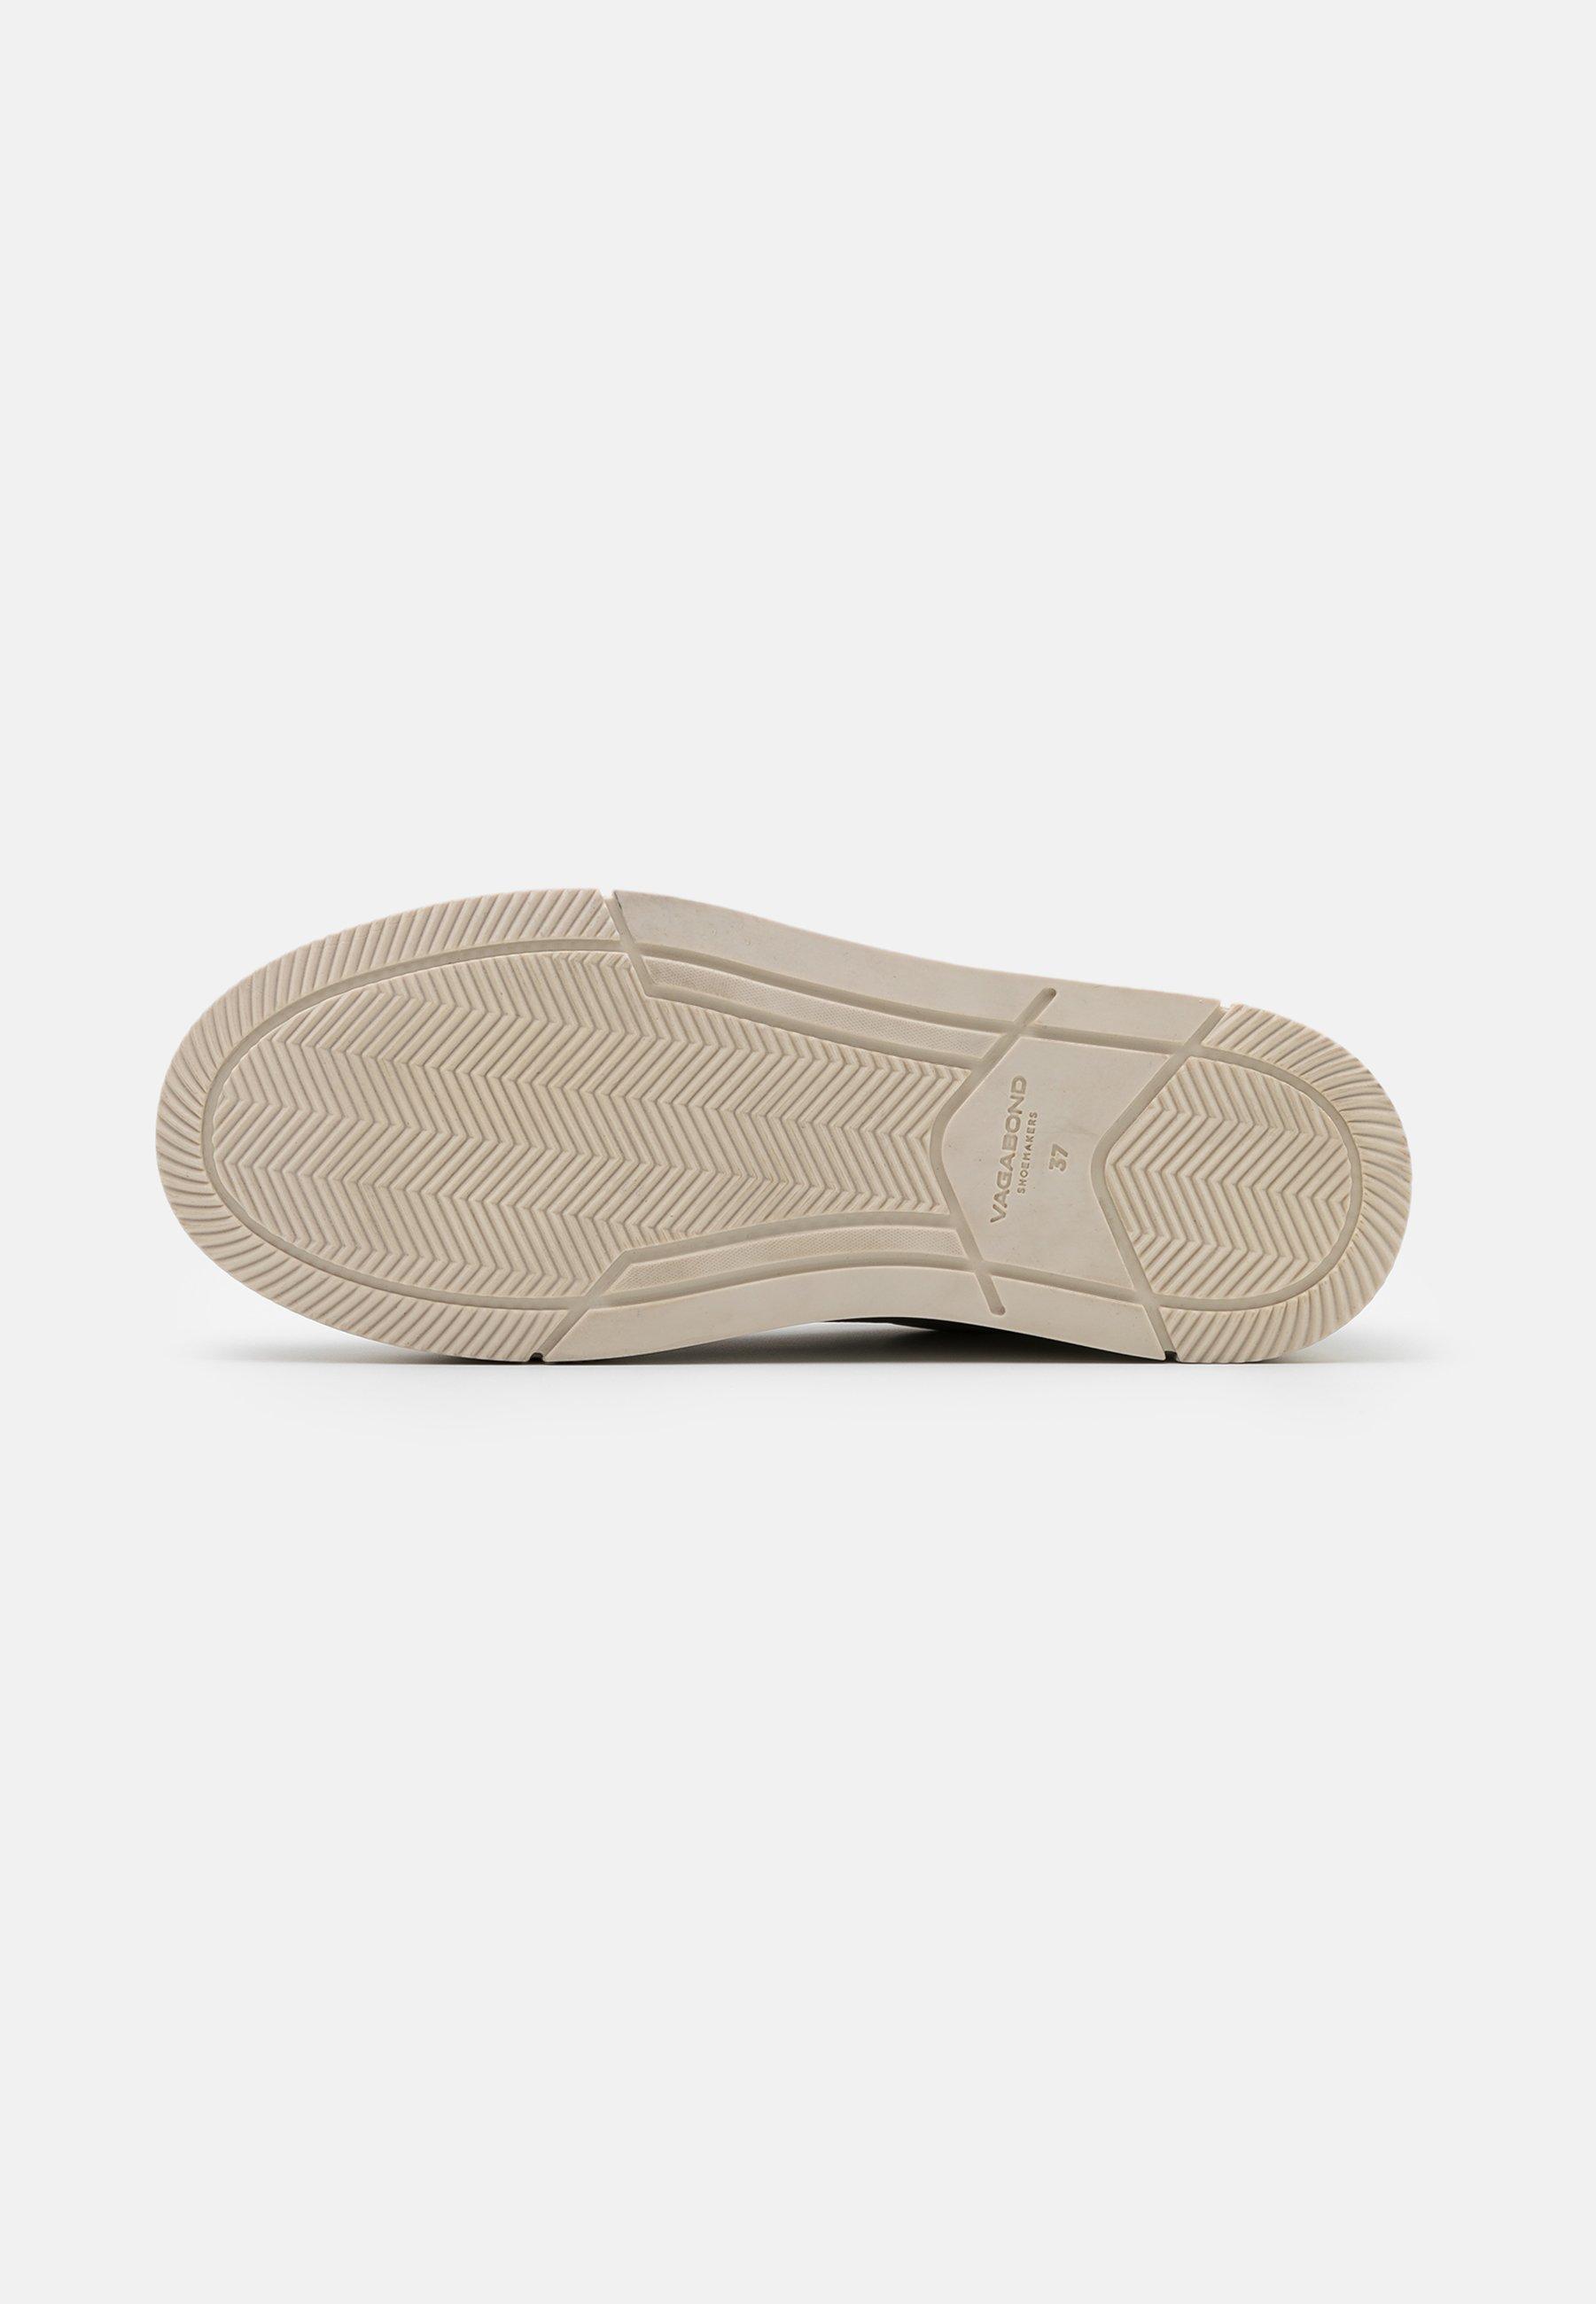 Vagabond JUDY Sneaker low plaster/offwhite